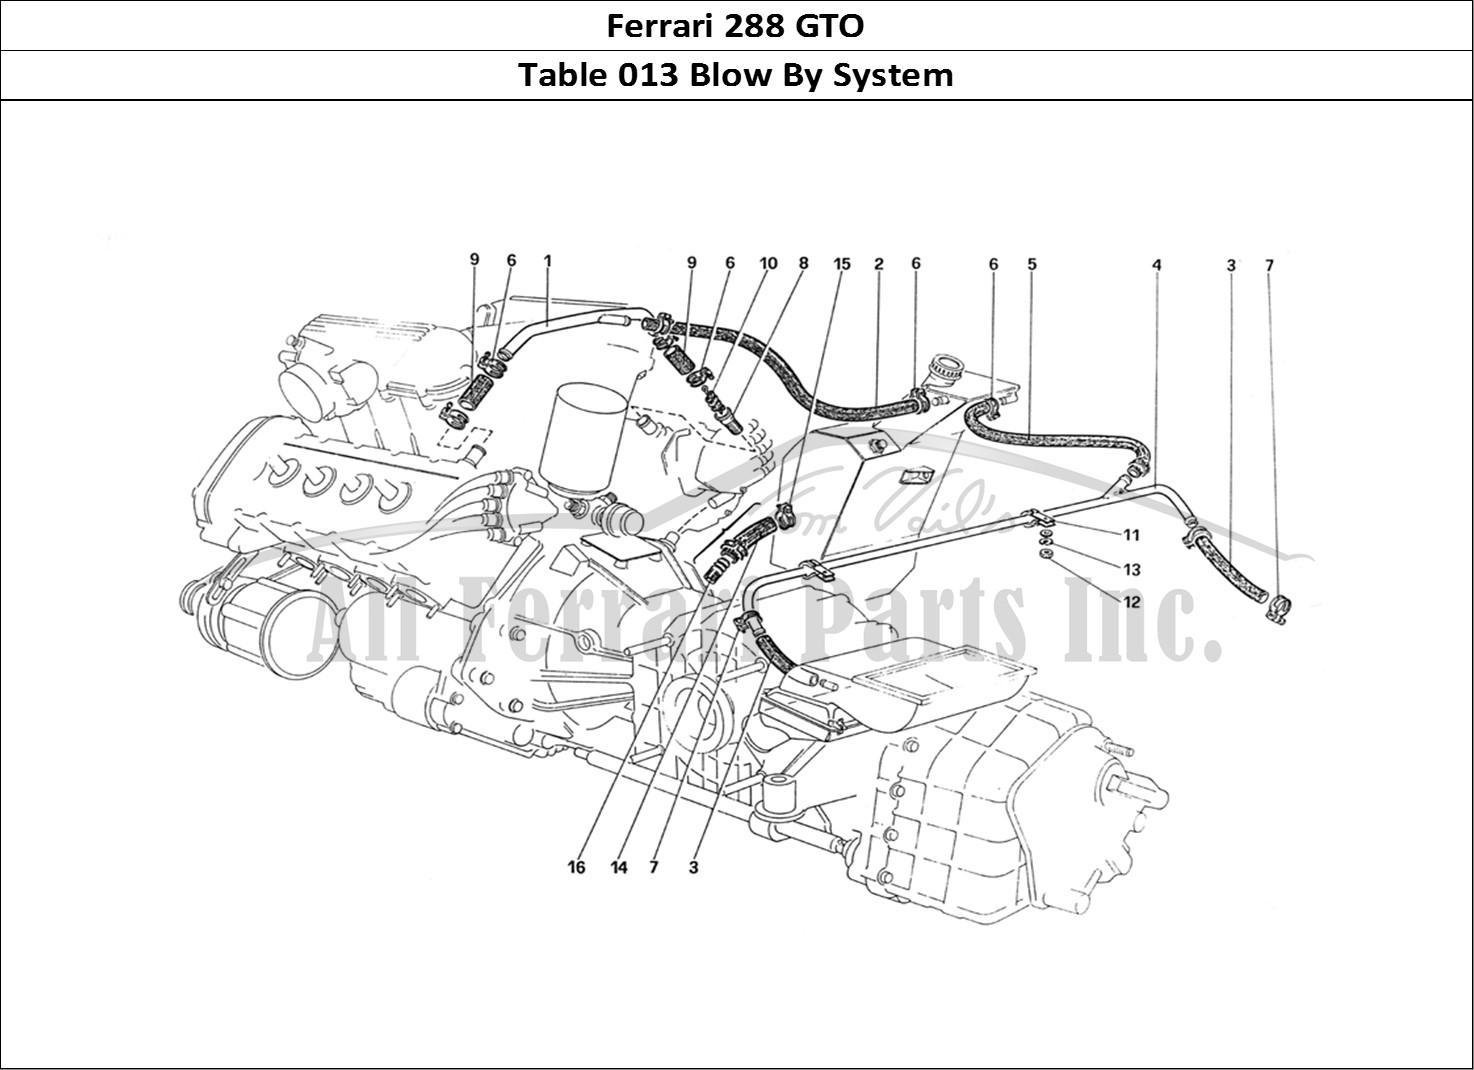 buy original ferrari 288 gto 013 blow by system ferrari parts  spares  accessories online